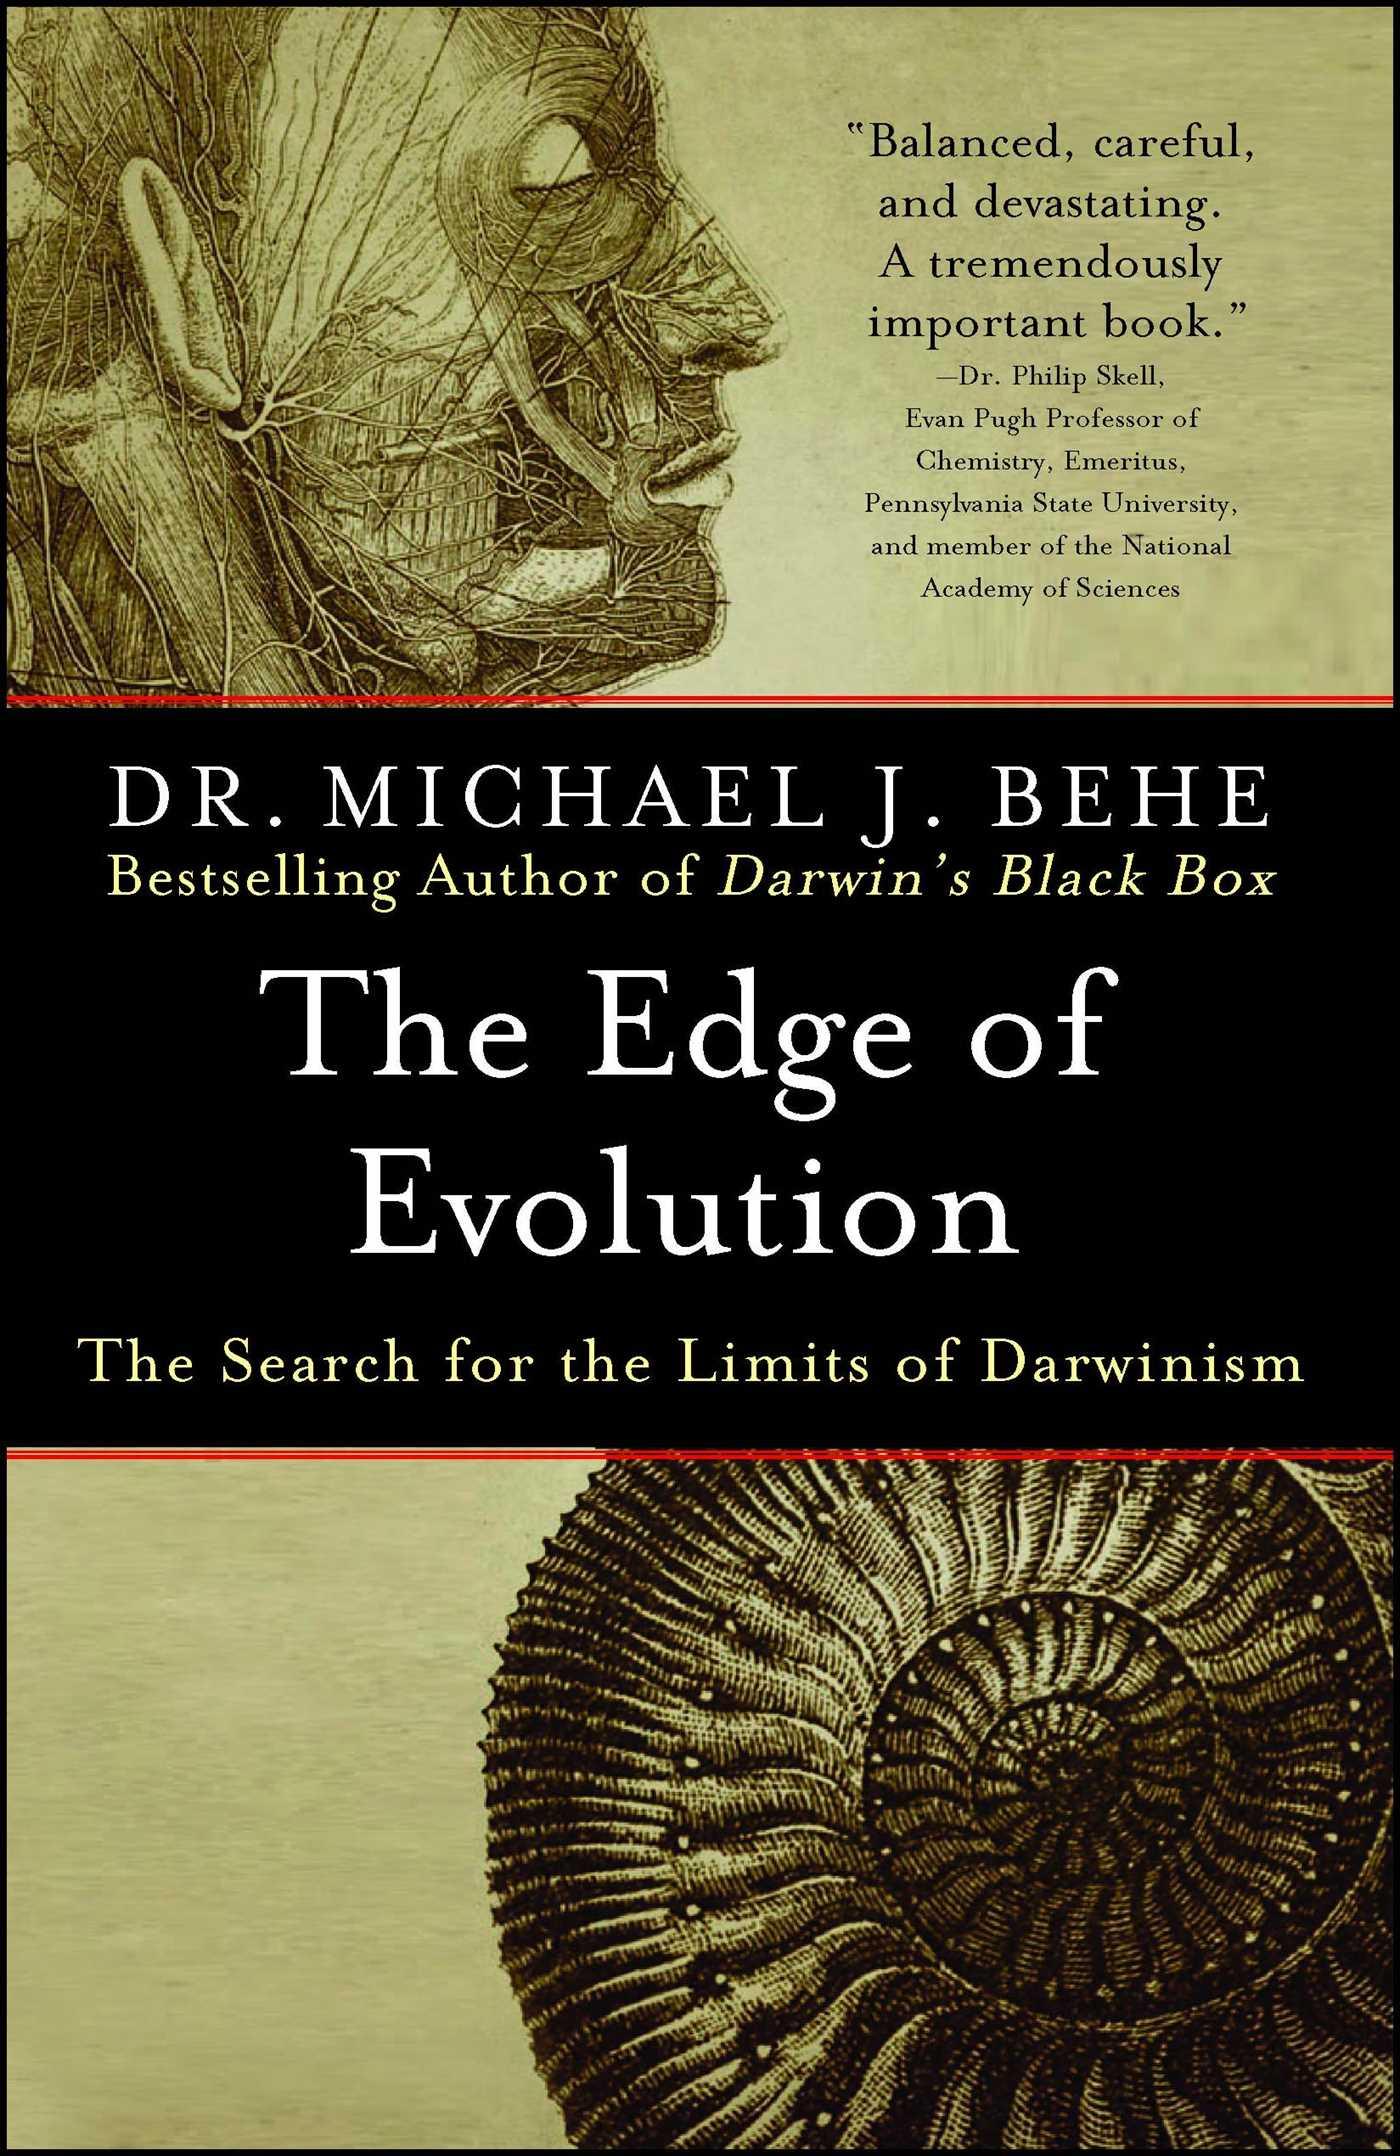 The edge of evolution 9780743296229 hr